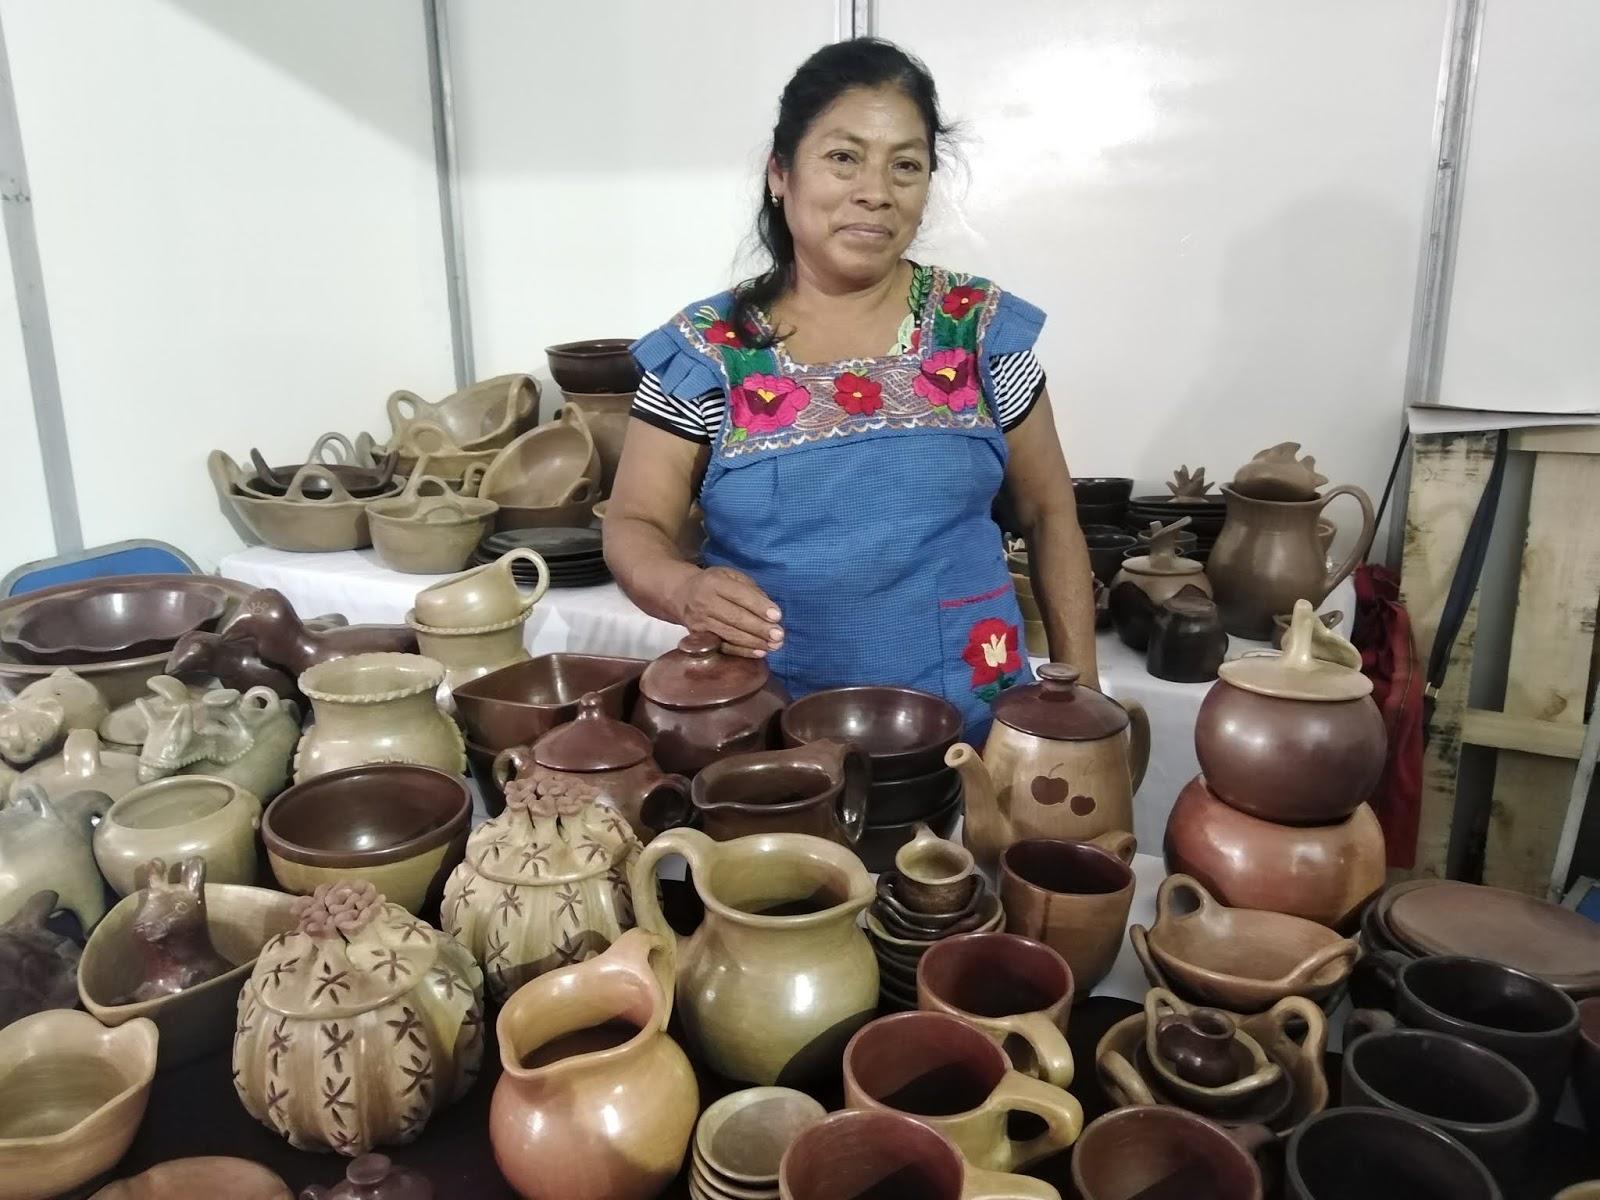 Artesanas de Tehuacán venden en redes sociales ante pandemia